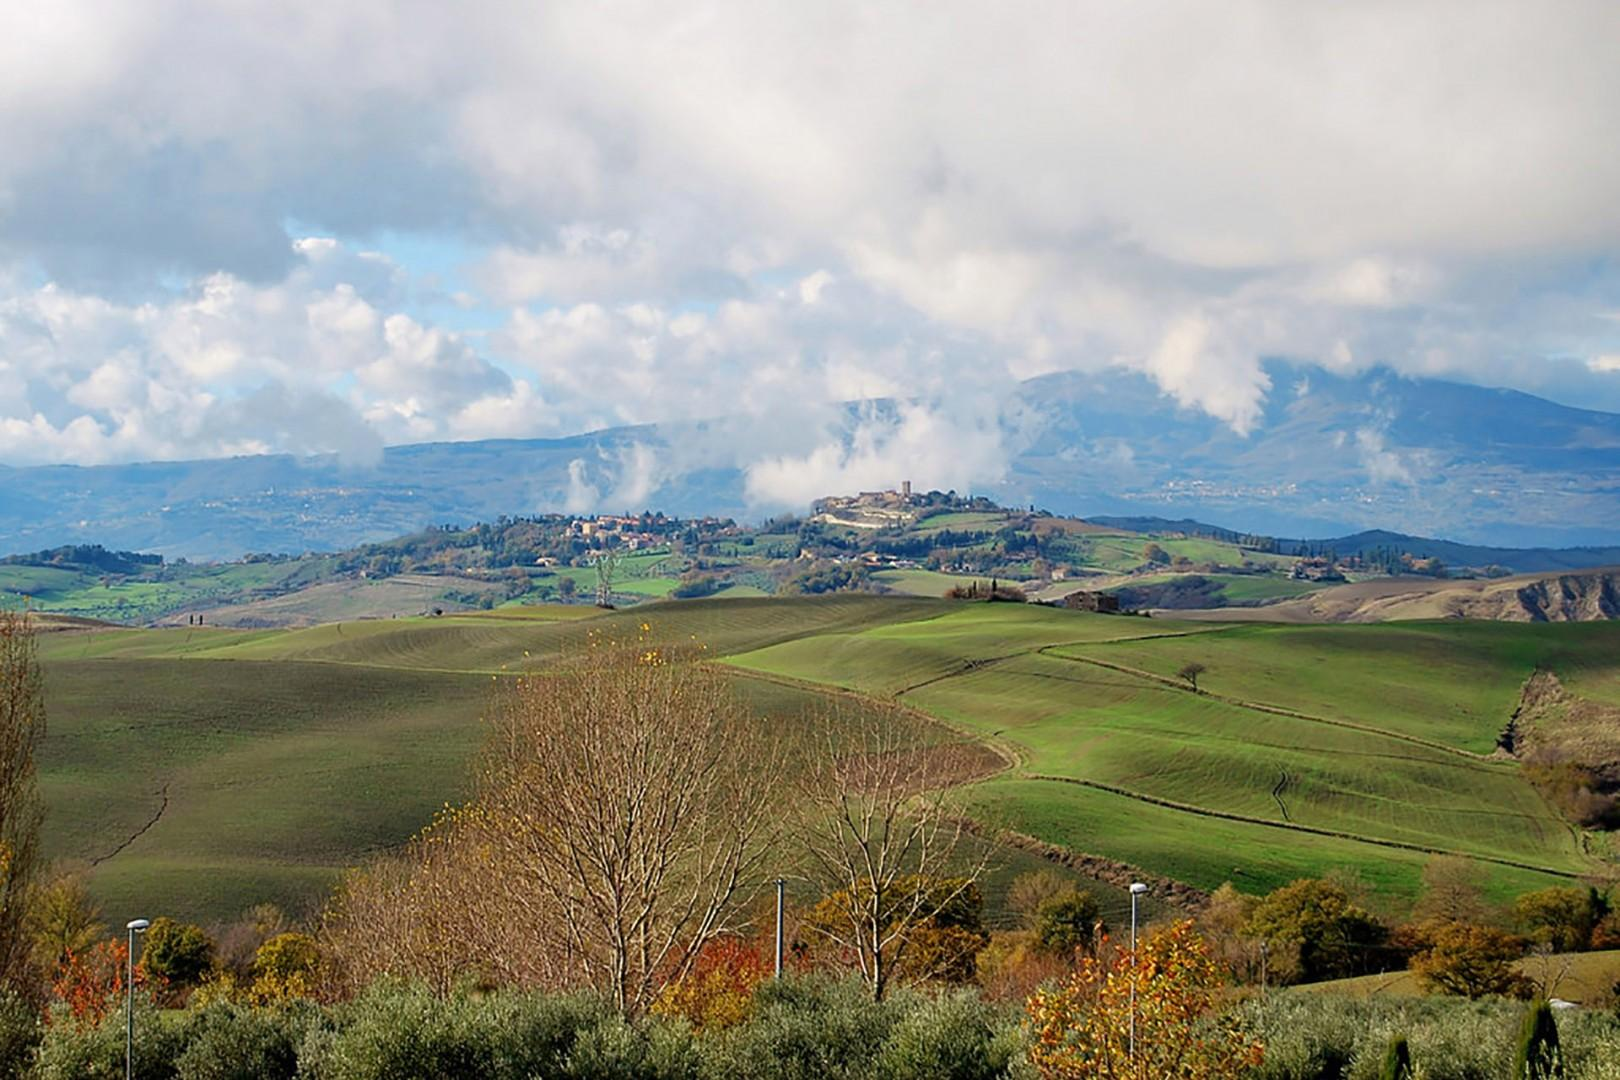 The charming Tuscan hilltown of San Casciano dei Bagni.